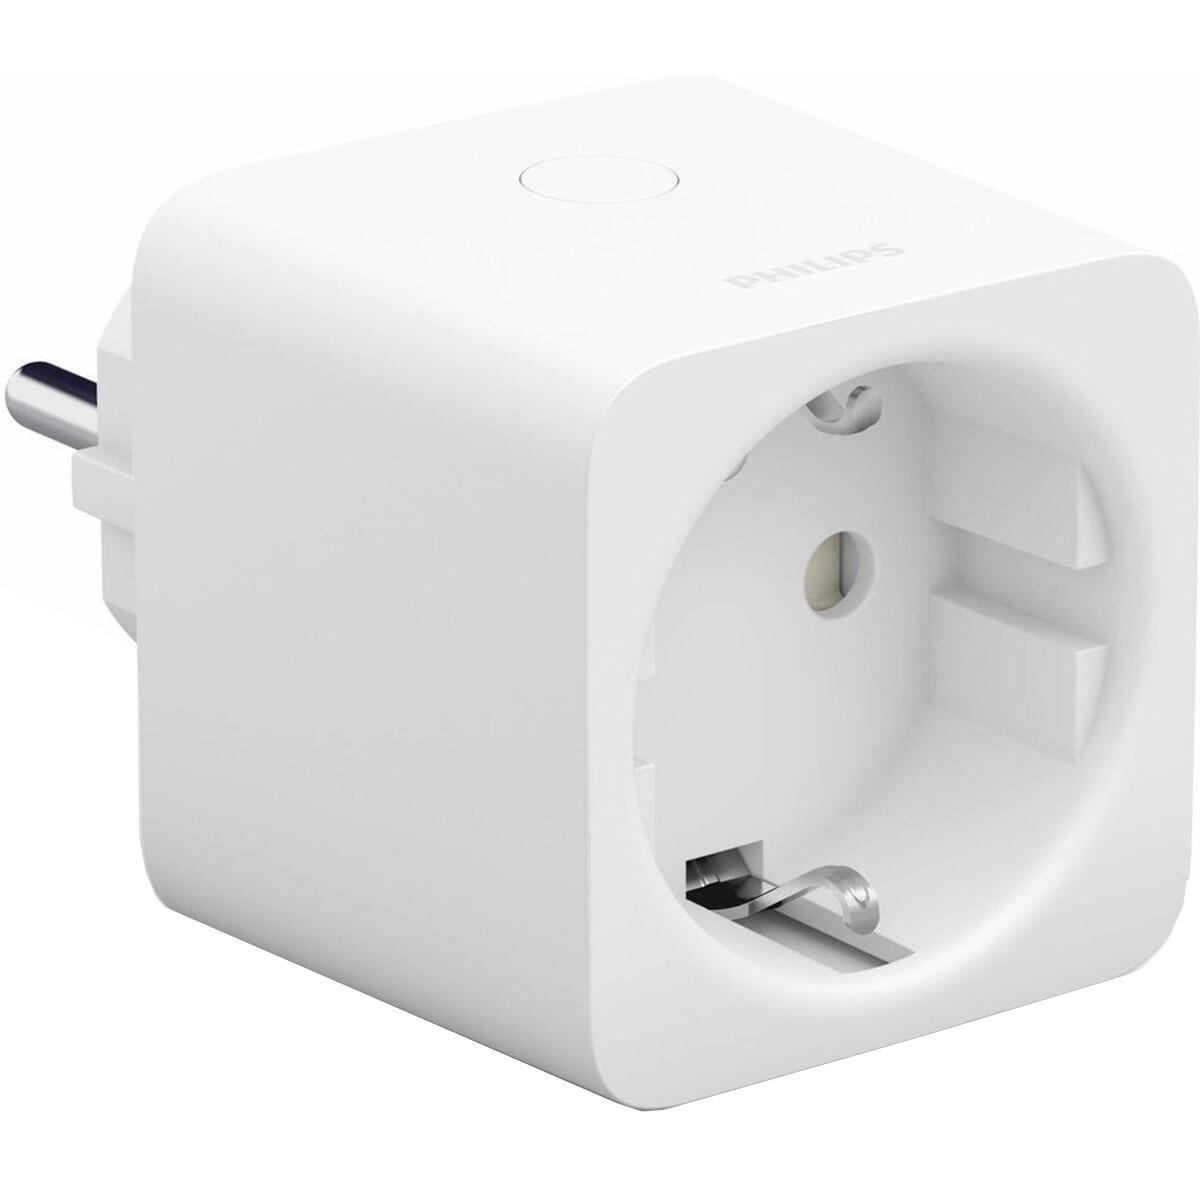 PHILIPS HUE - Smart Plug - Slimme Stekker - Bluetooth - Vierkant - Wit